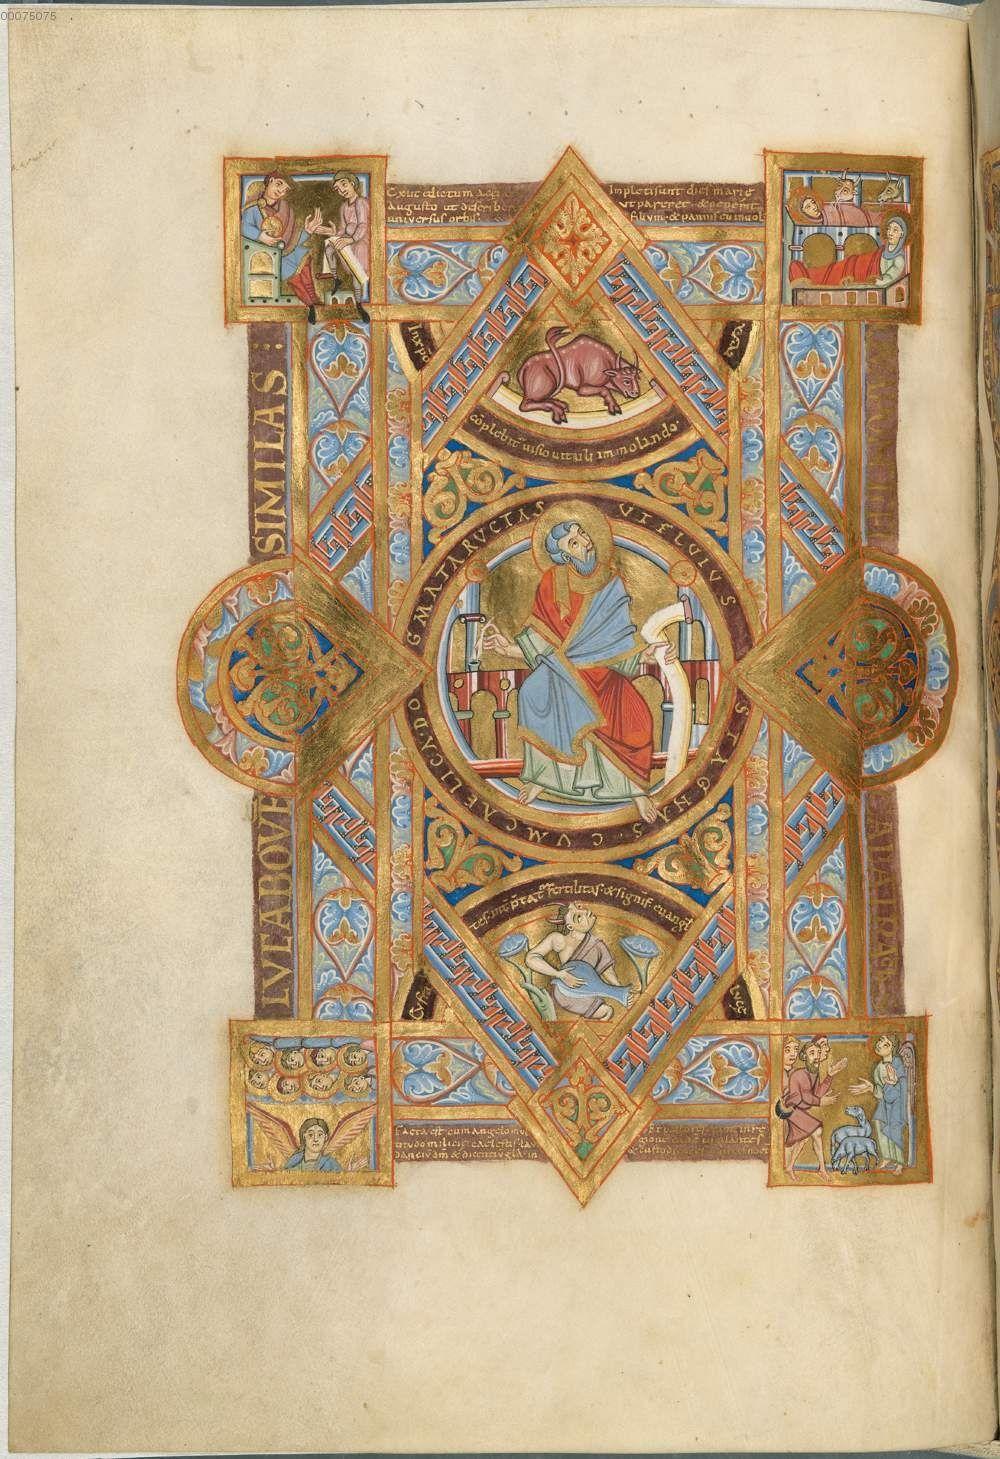 Quattuor Evangelia - Uta-Evangelistar (Uta-Codex) - BSB Clm 13601, [S.l.], 11. Jh. [BSB-Hss Clm 13601]